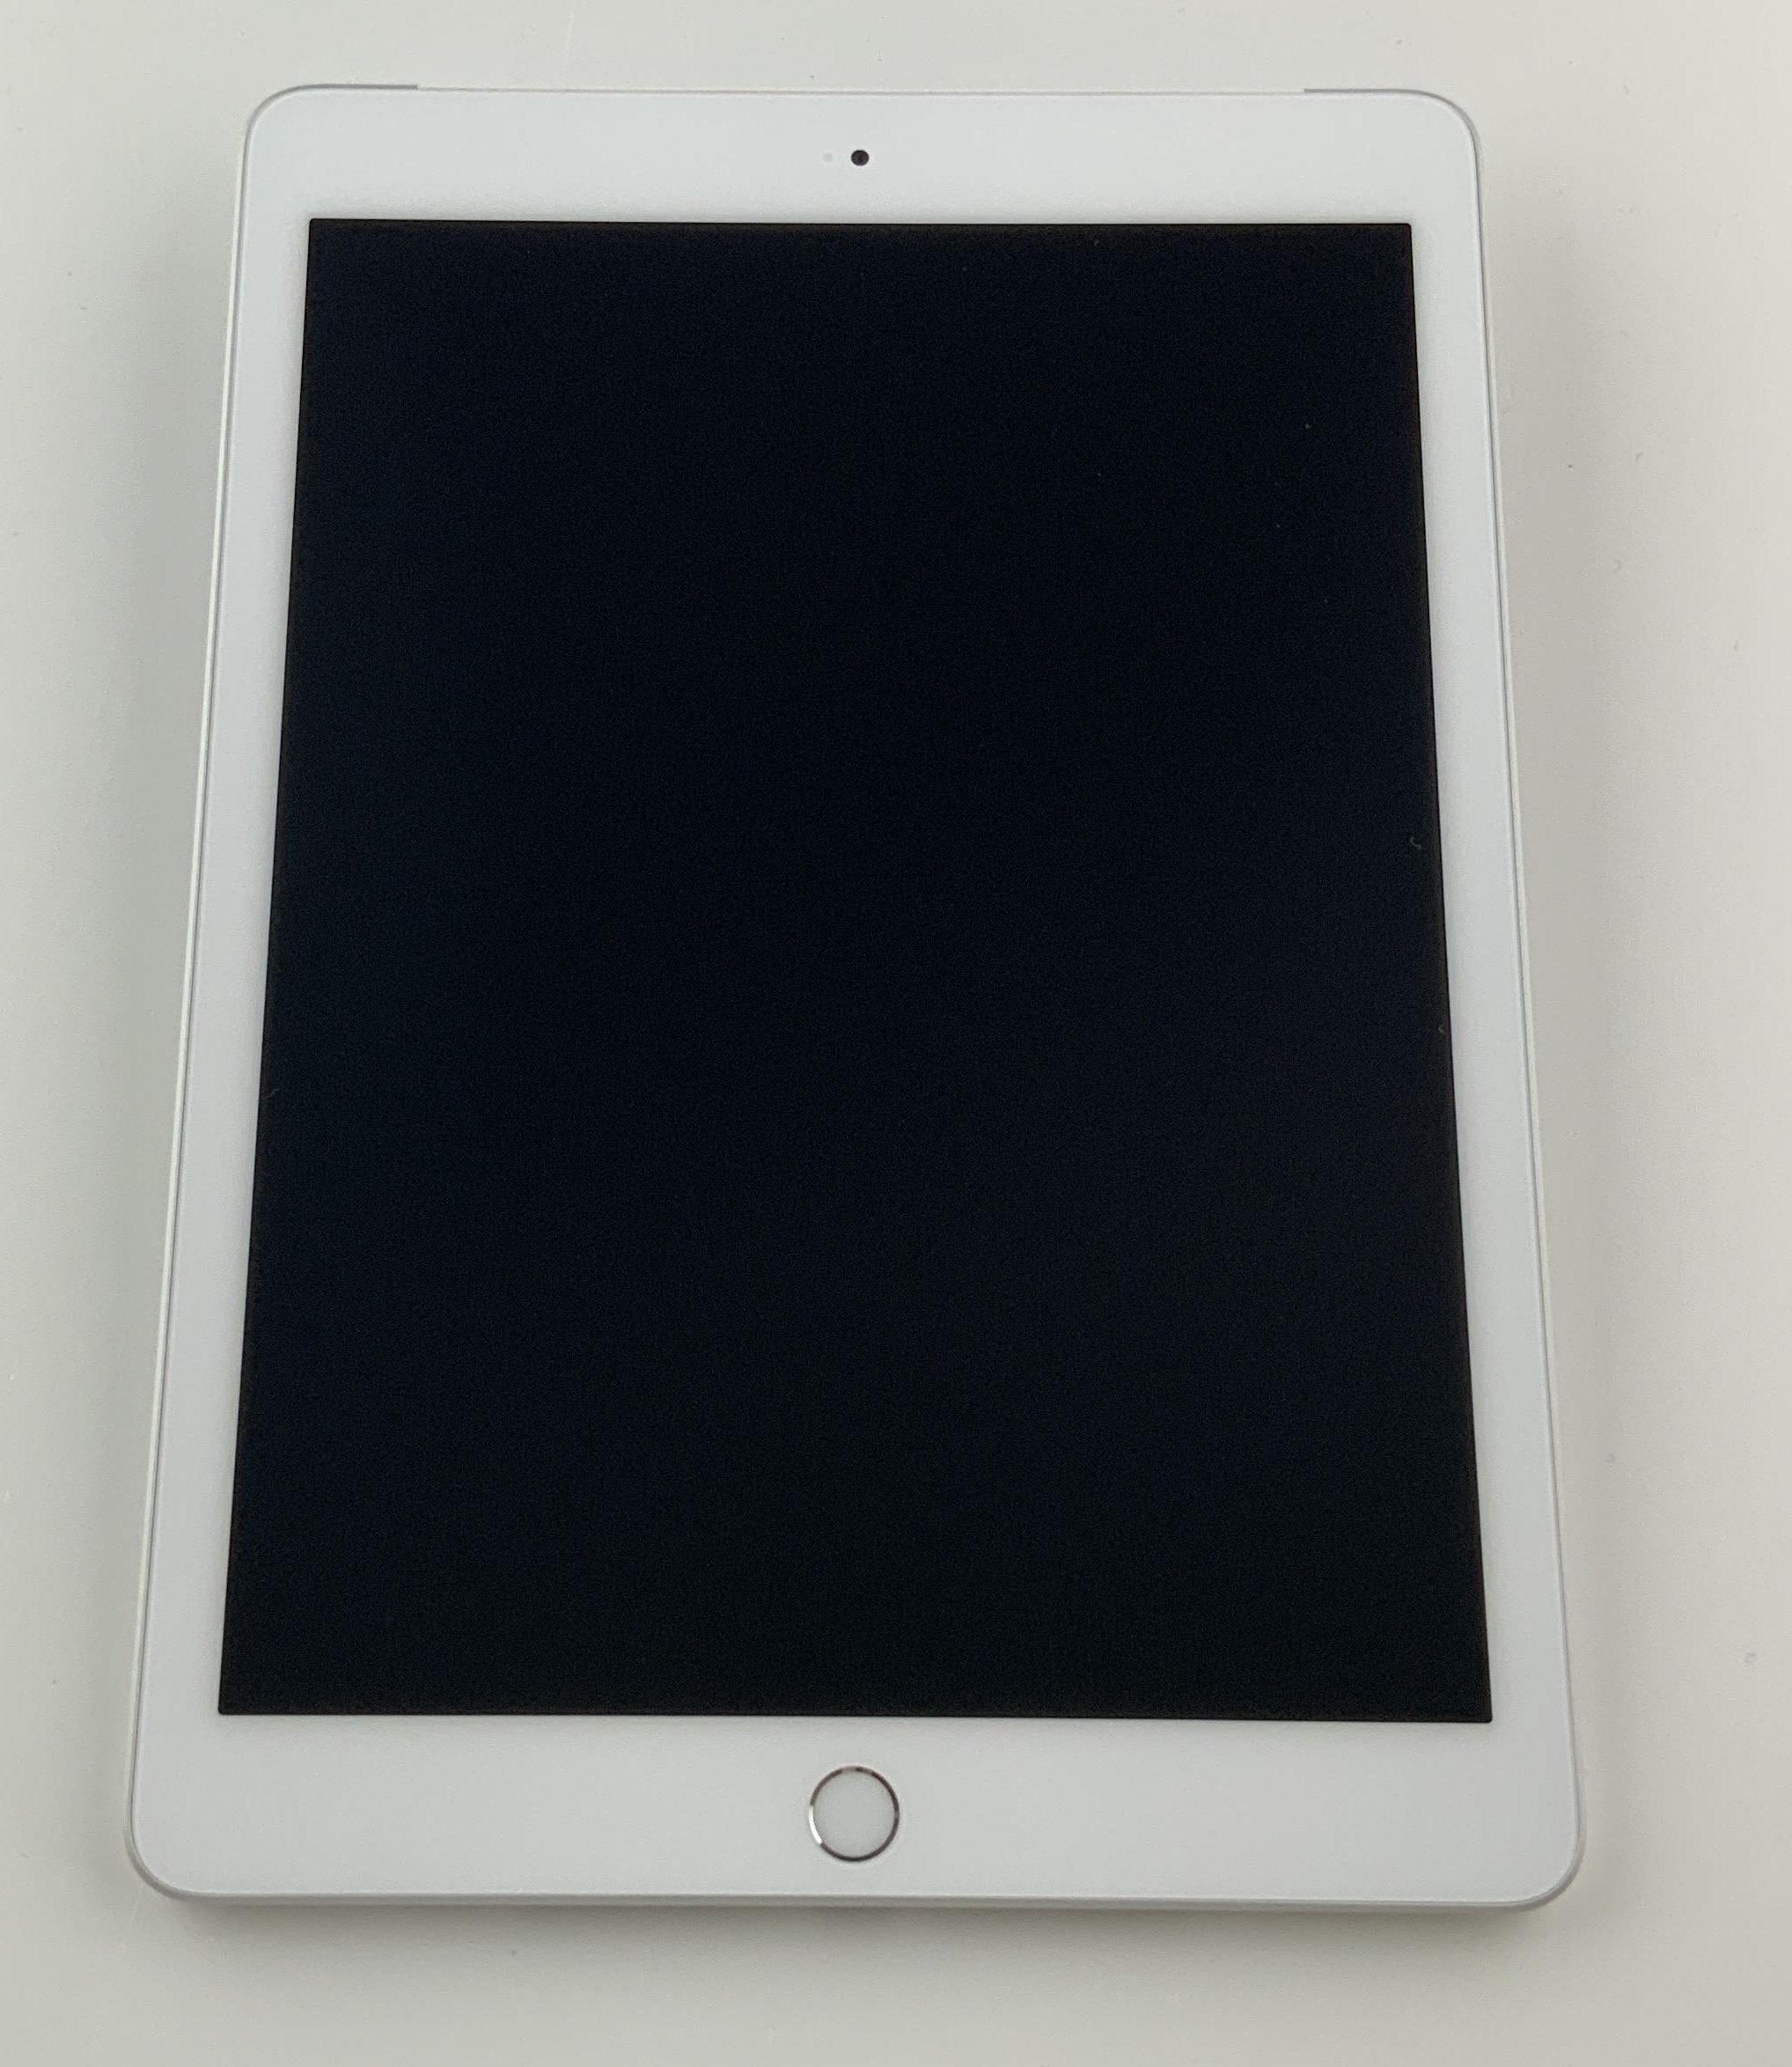 iPad 6 Wi-Fi + Cellular 32GB, 32GB, Silver, Bild 1